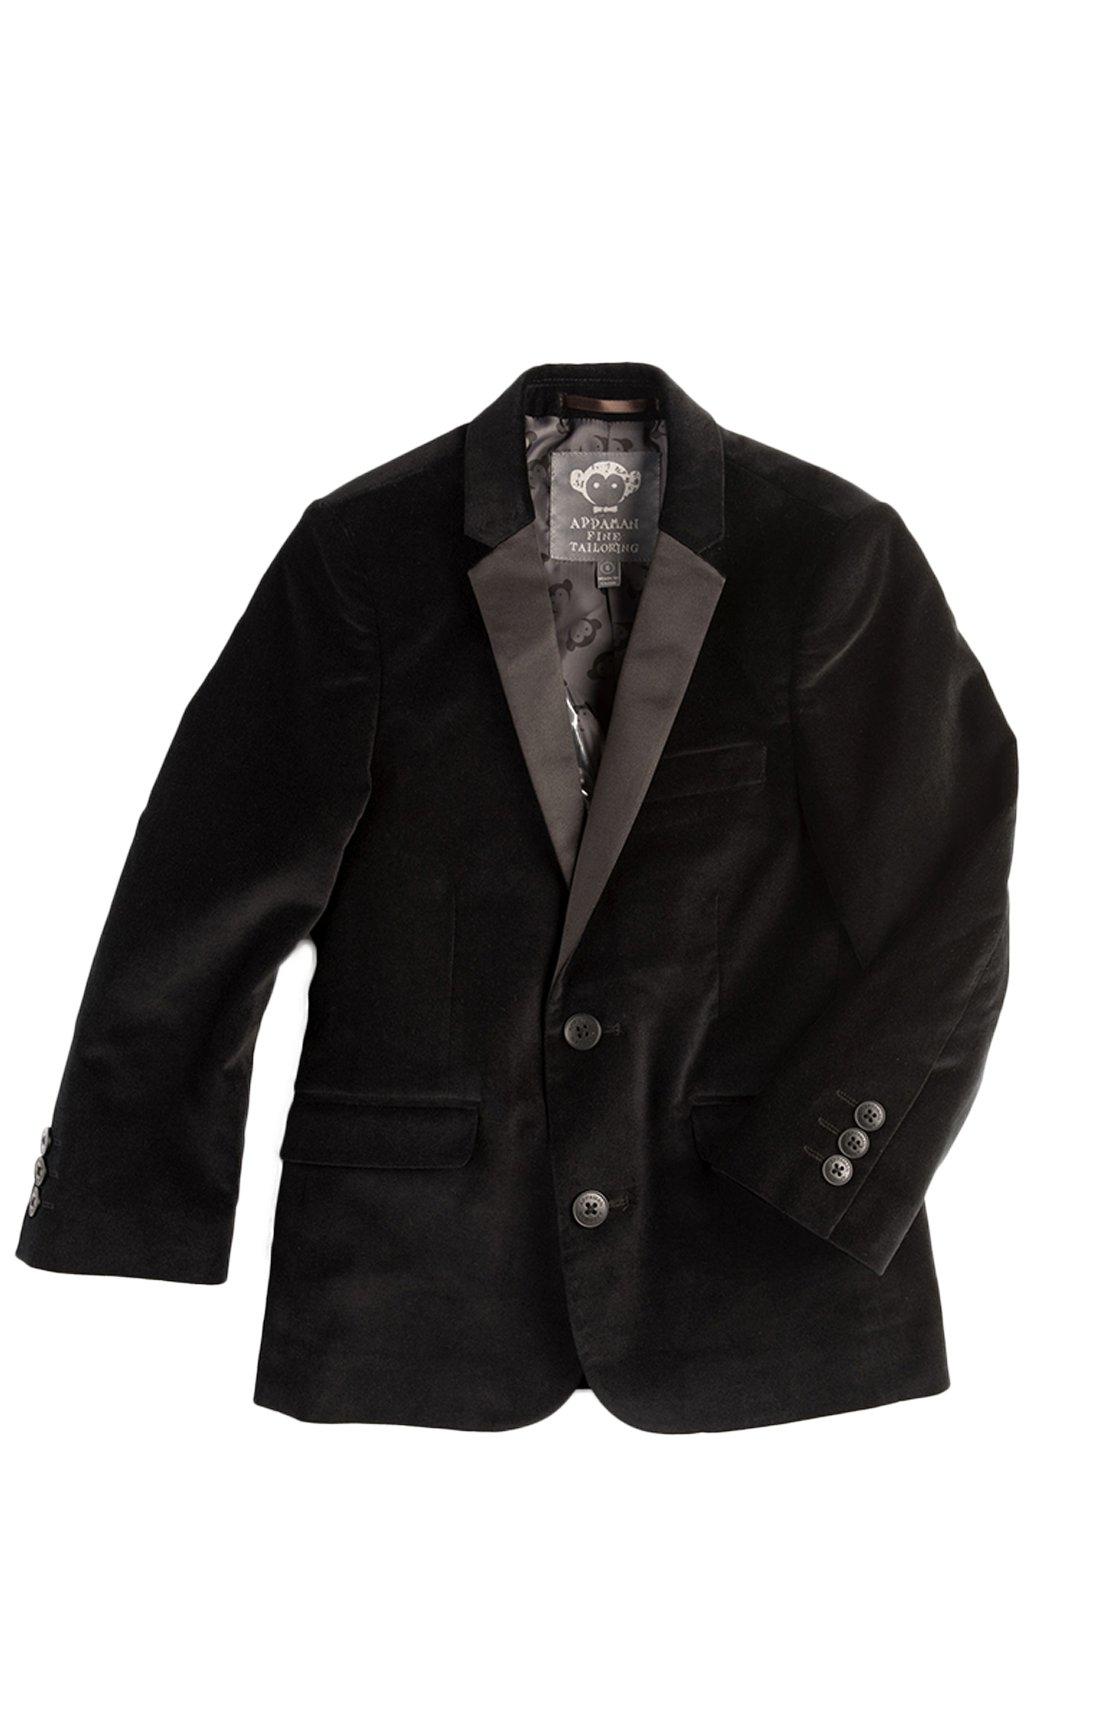 Appaman Boys' Tuxedo Blazer, Black Velvet, 5 by Appaman